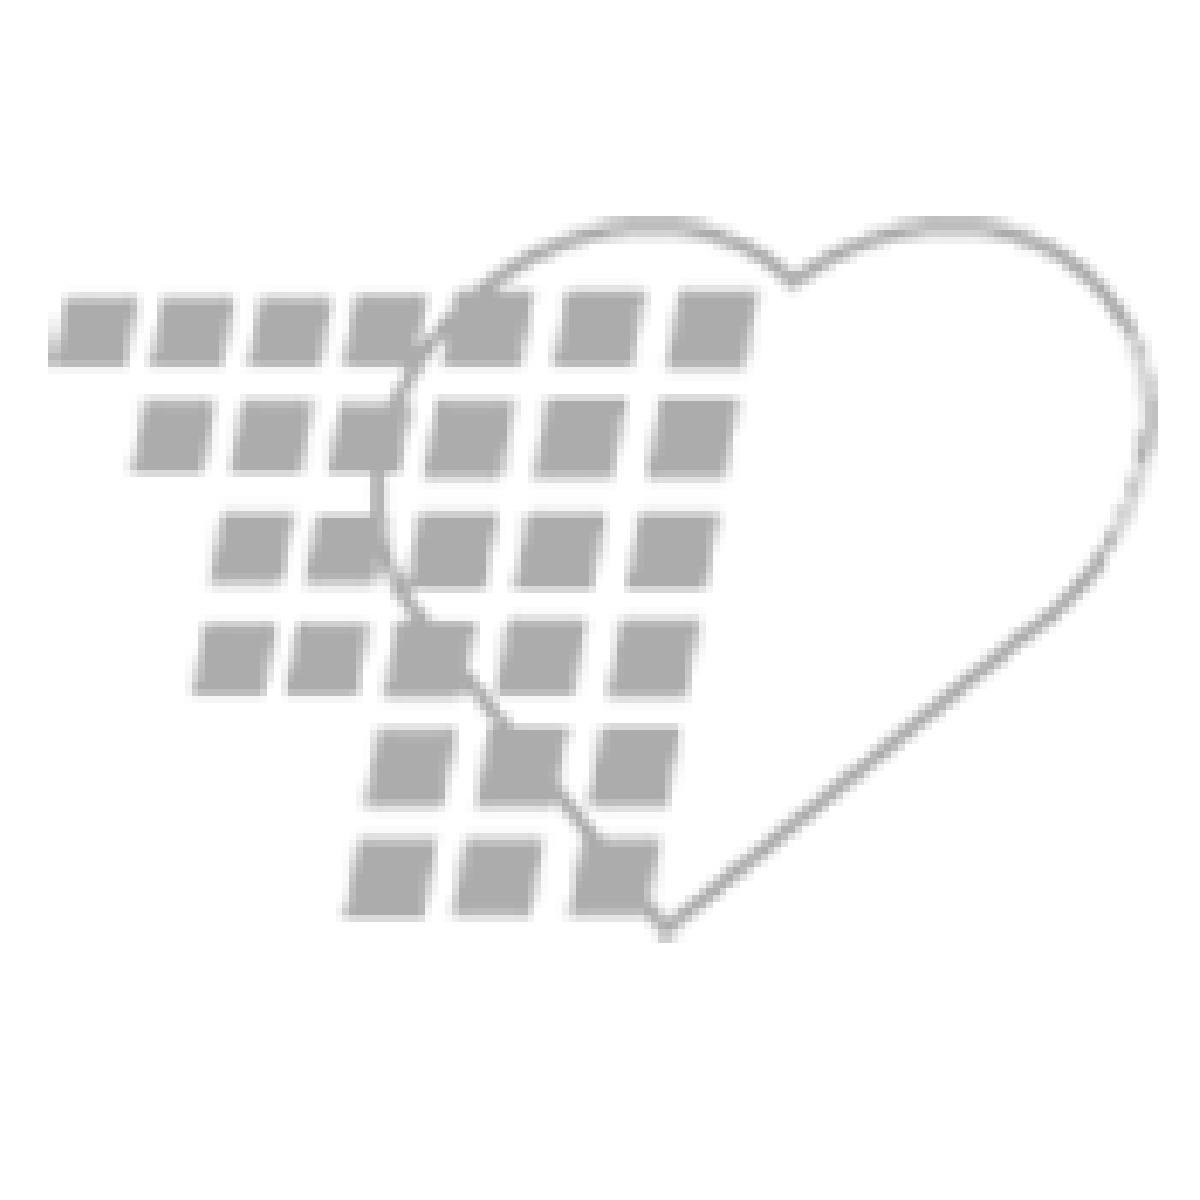 08-02-1424-16OZ - Povidone Iodine Scrub Solution -16oz